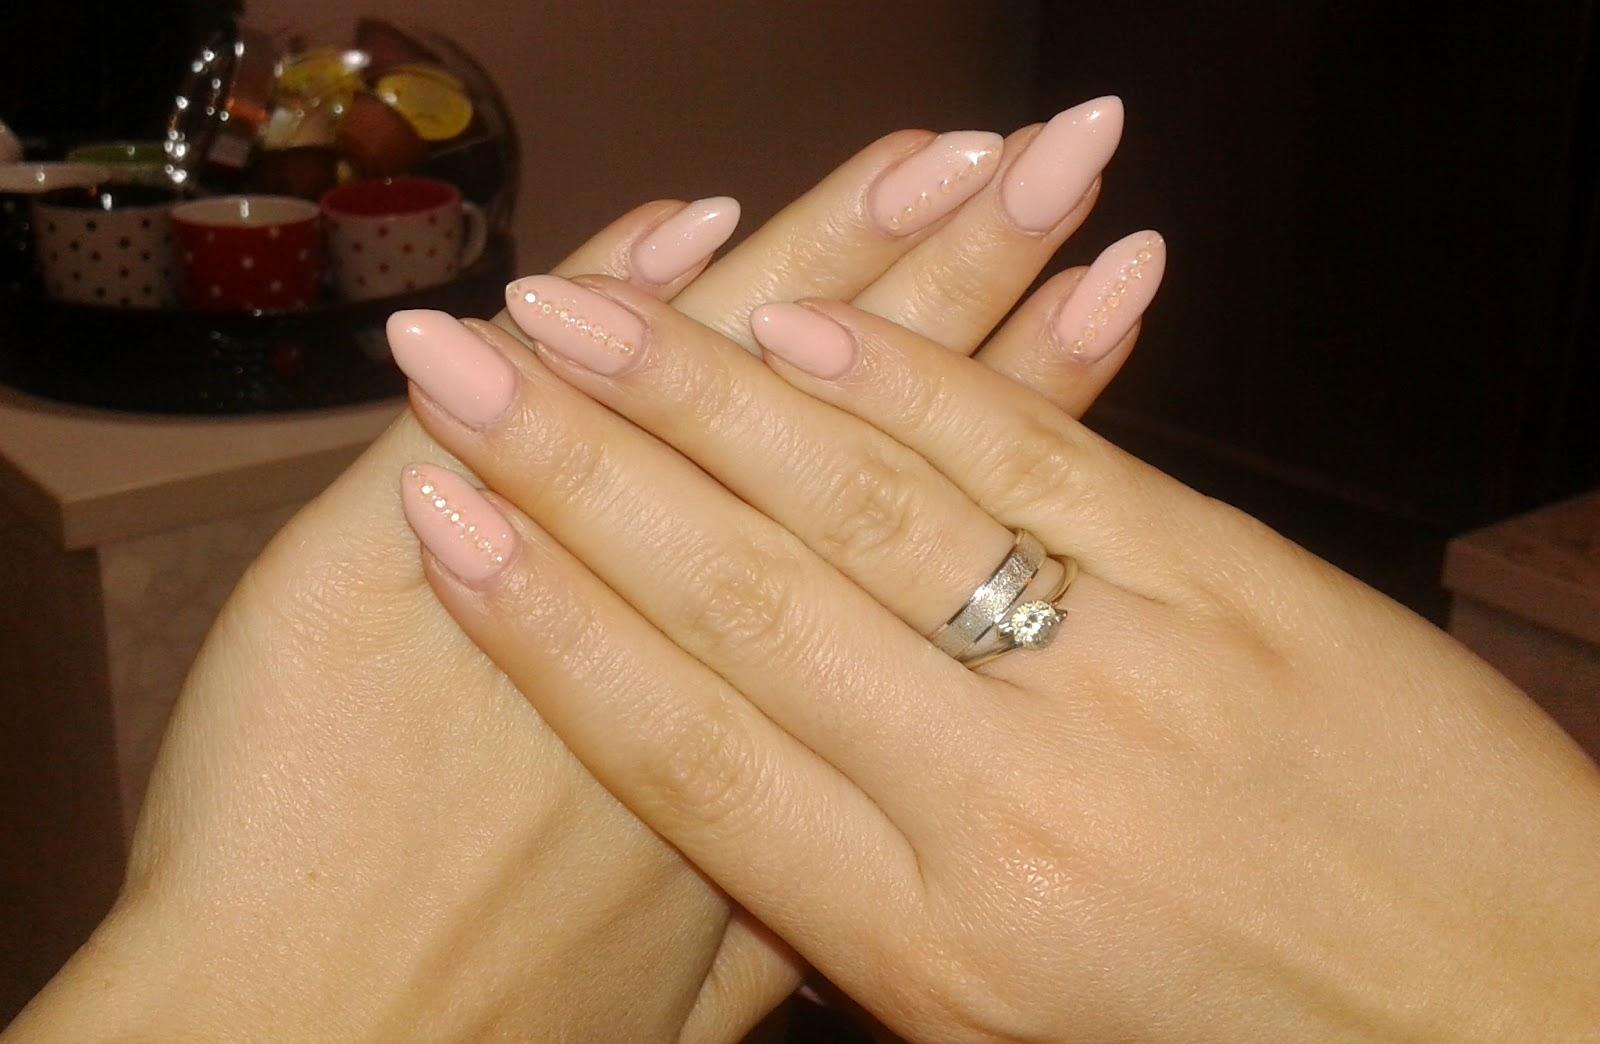 beauty, nails, stiletto nails, nude stiletto nails with rhinestones, nail art, nail design, diy nails, gel nails